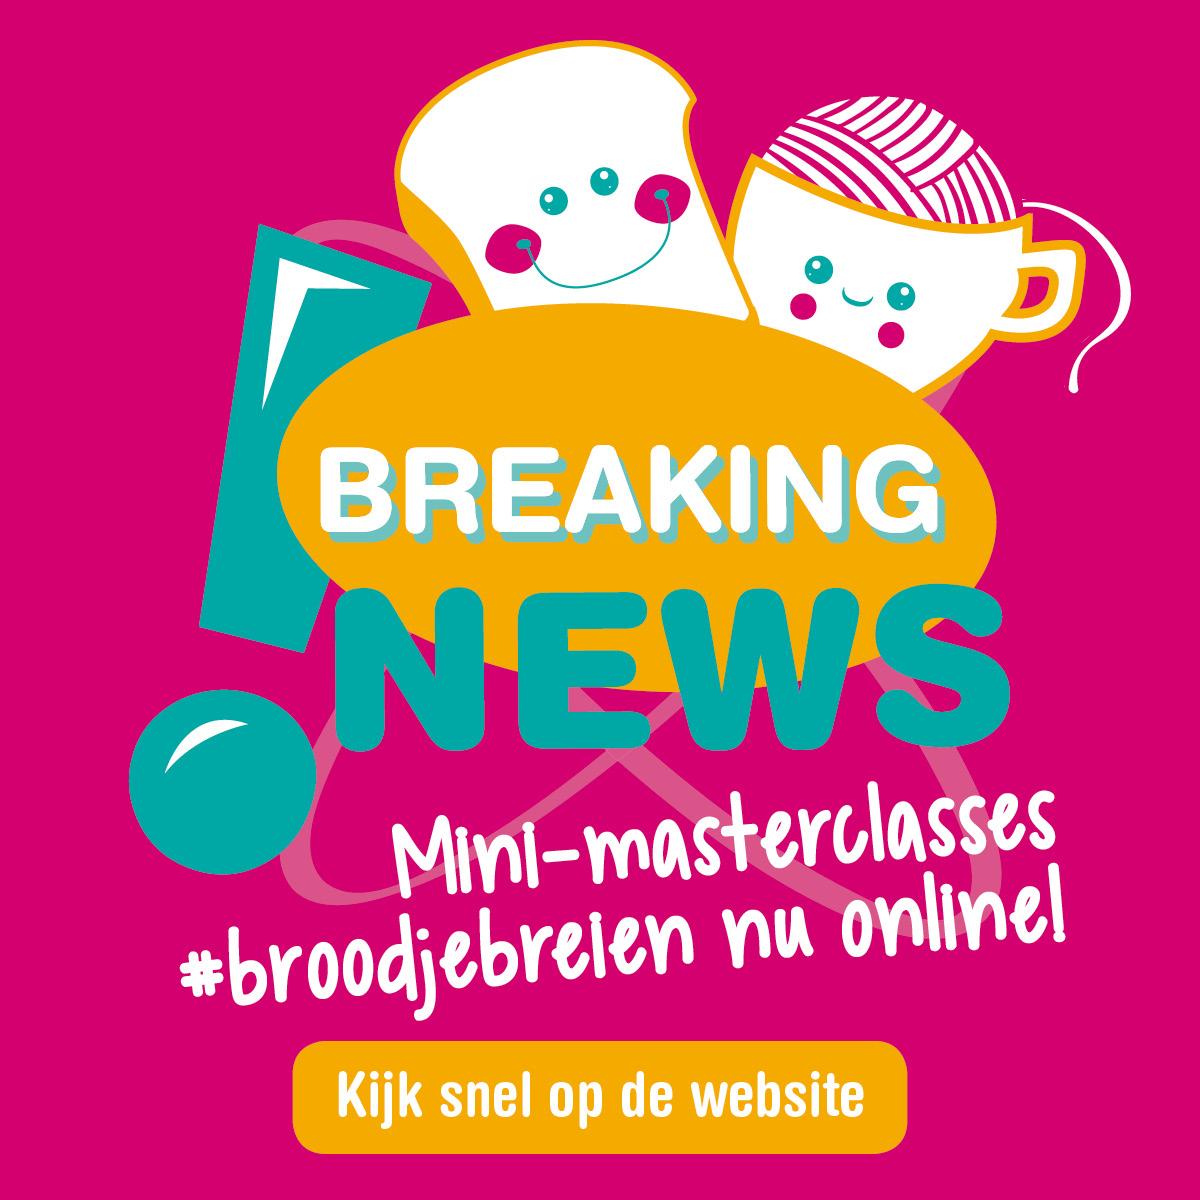 Post_nieuwsbrief_breakingnews_masterclassesKK